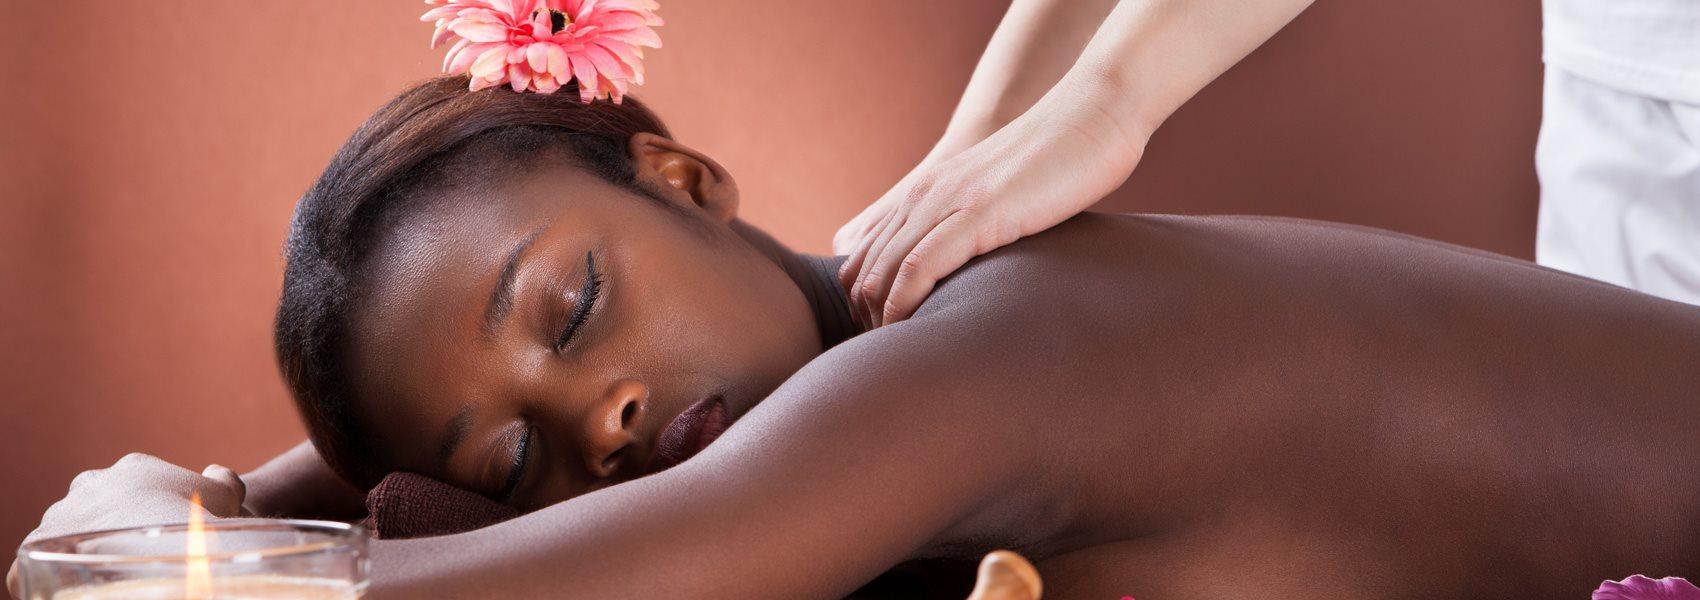 Swedish lesbian massage